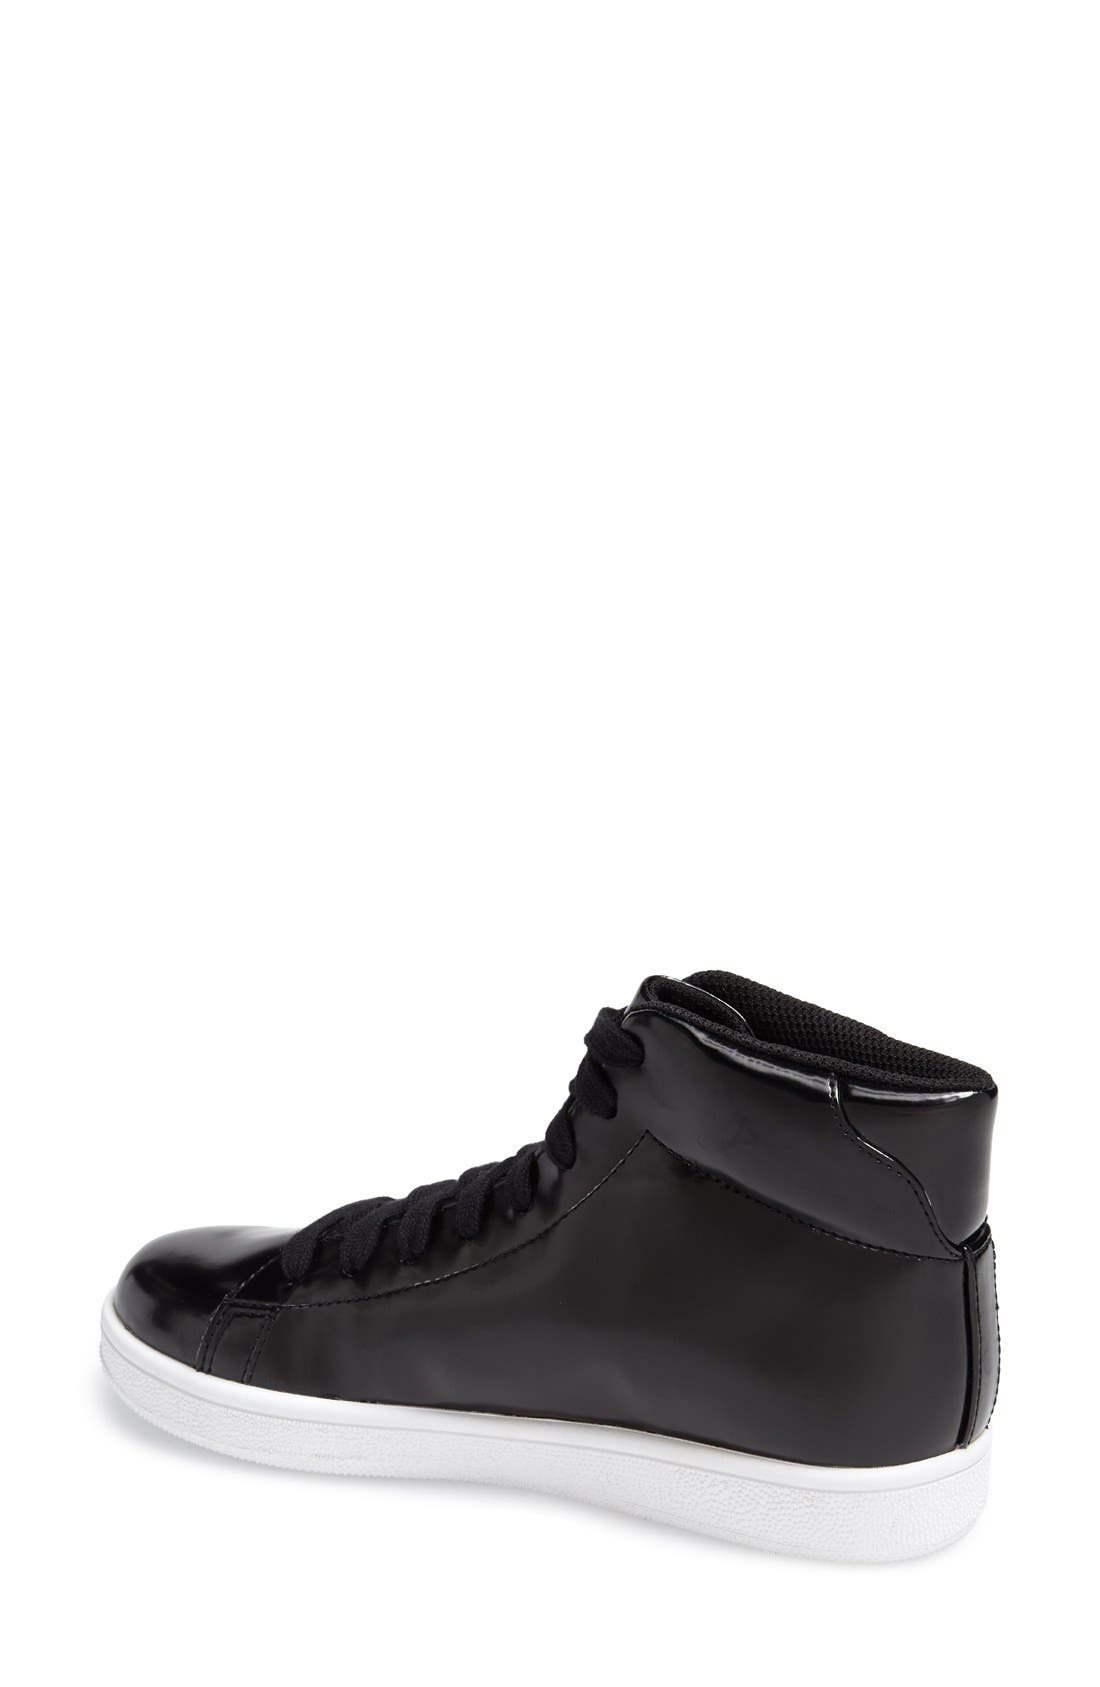 Alternate Image 2  - Jeffrey Campbell 'Player' High Top Sneaker (Women)